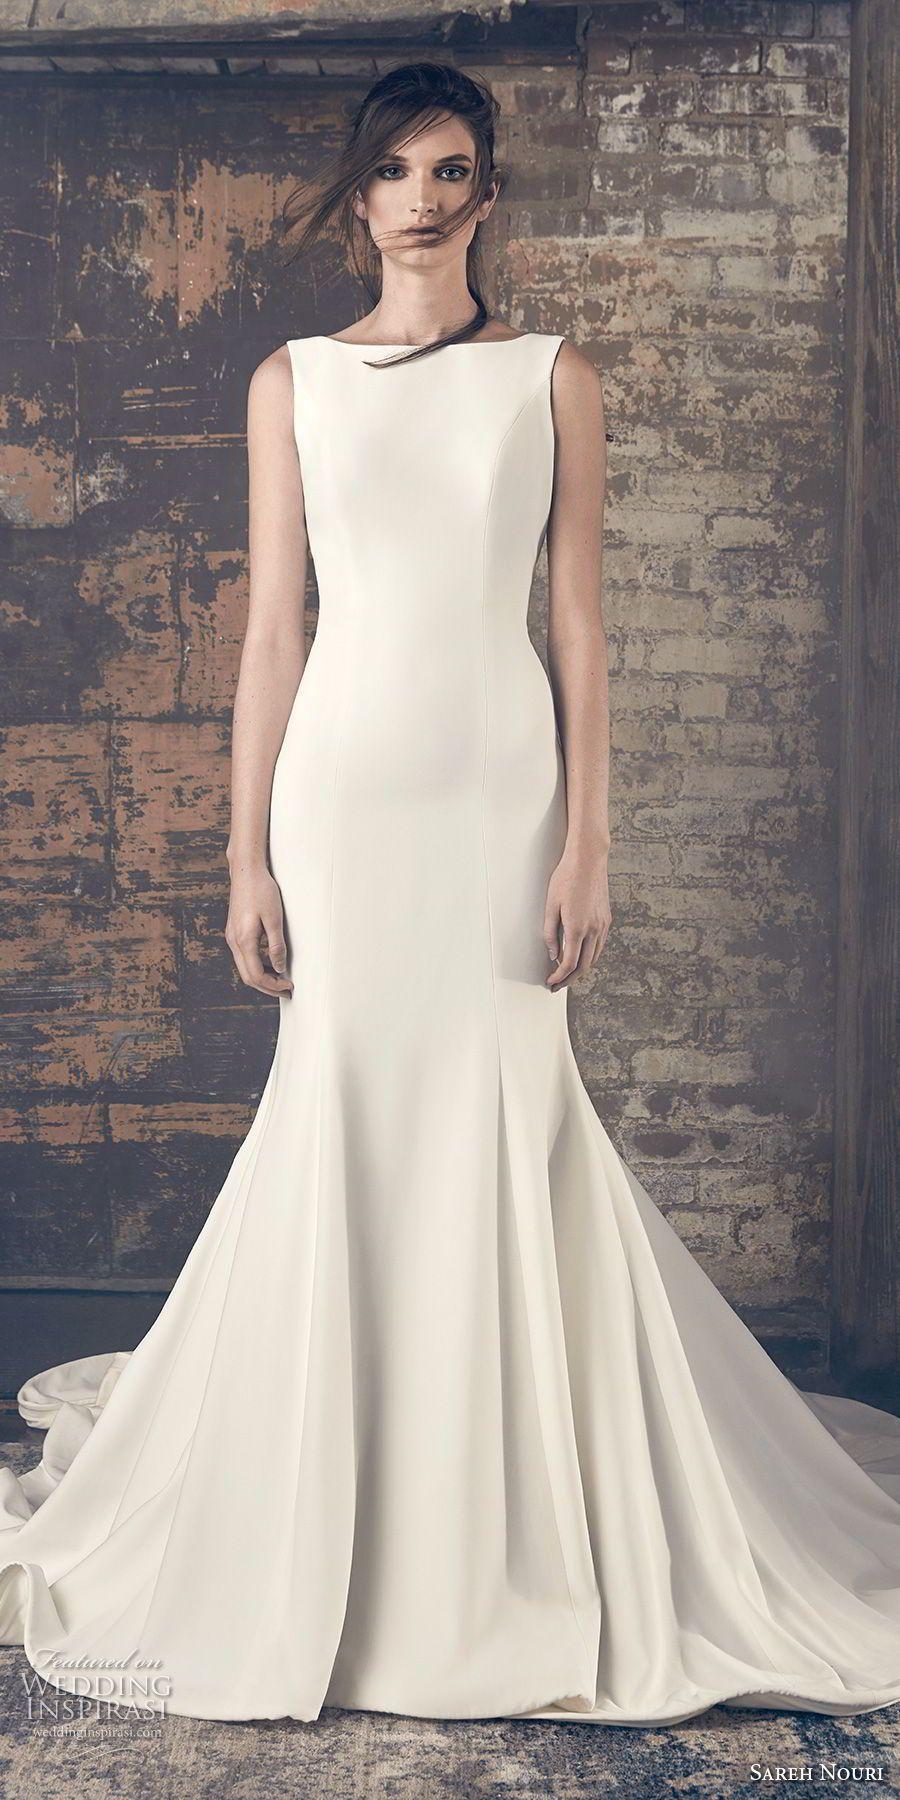 Sareh Nouri Fall 2018 Wedding Dresses Wedding Inspirasi High Neck Wedding Dress Simple Wedding Gowns Halter Wedding Dress [ 1800 x 900 Pixel ]